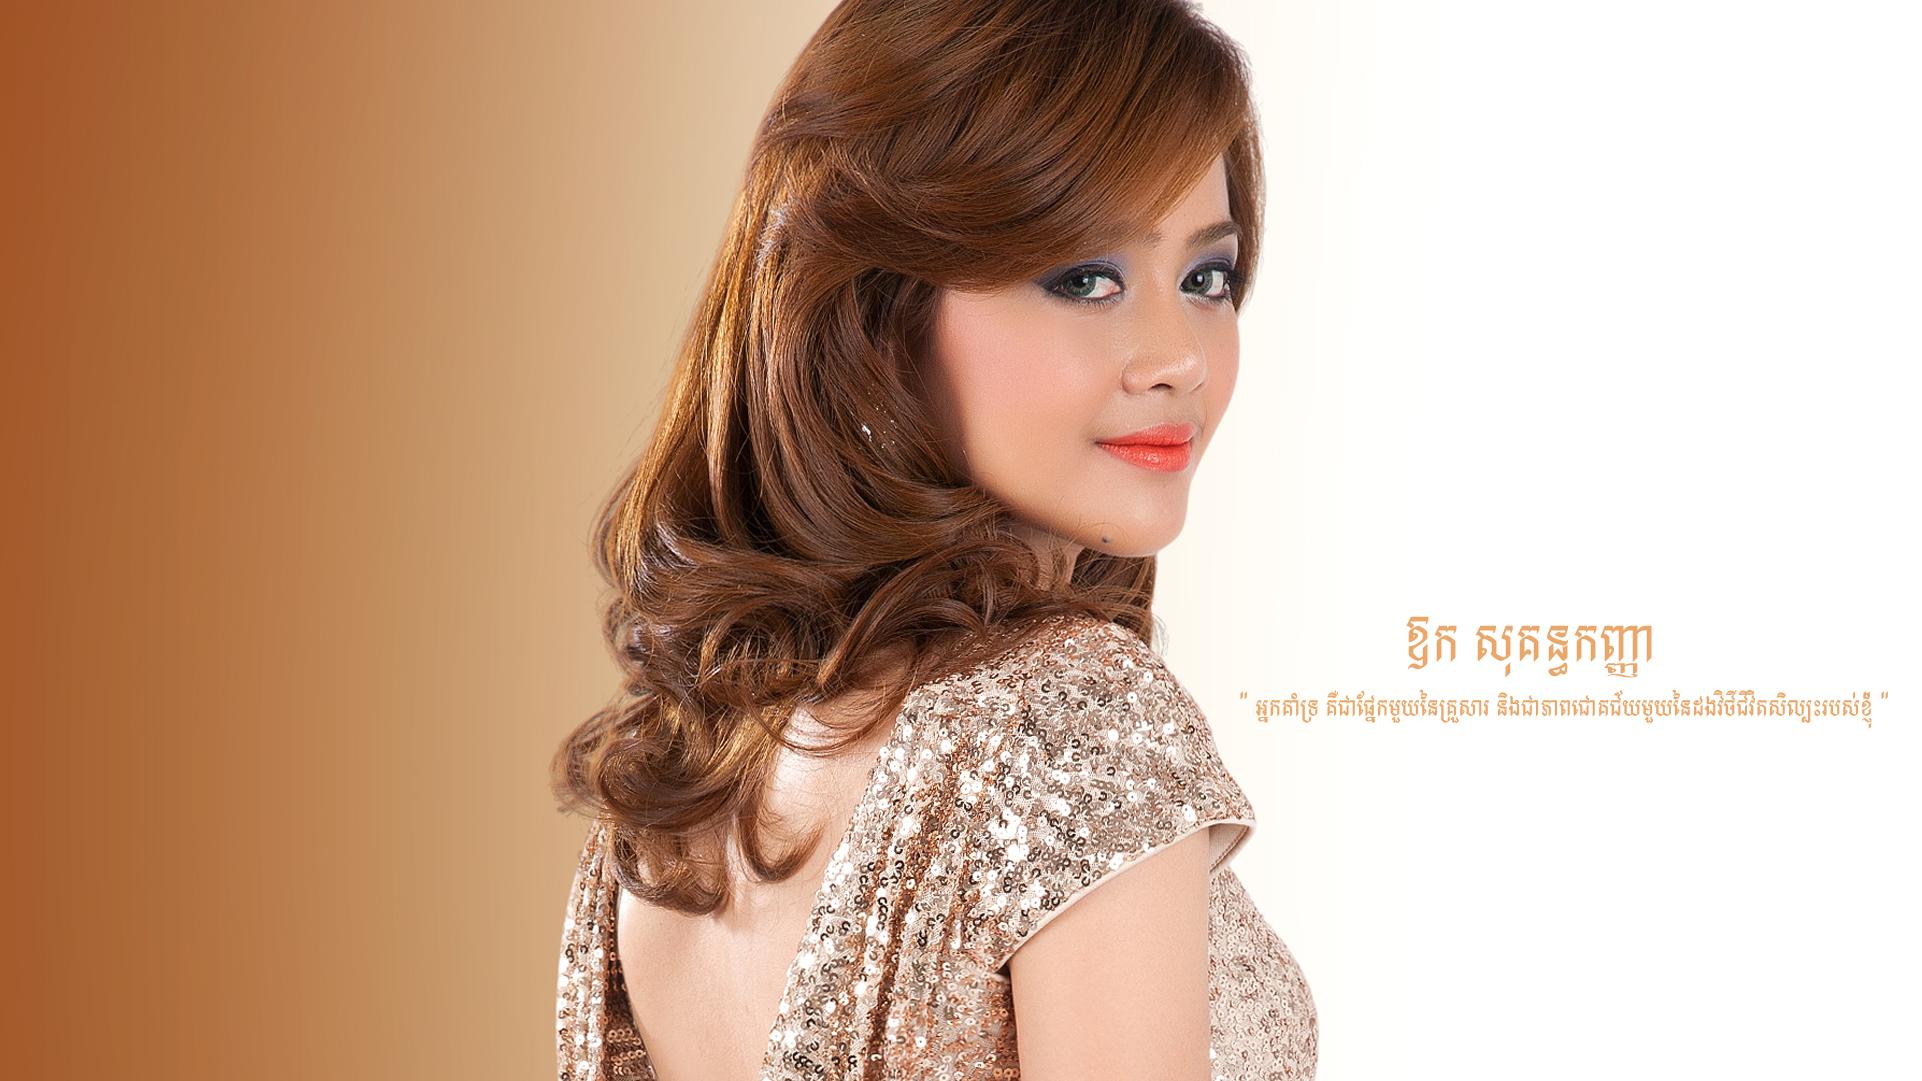 Singer, Actress Aok Sokunkanha - age: 33